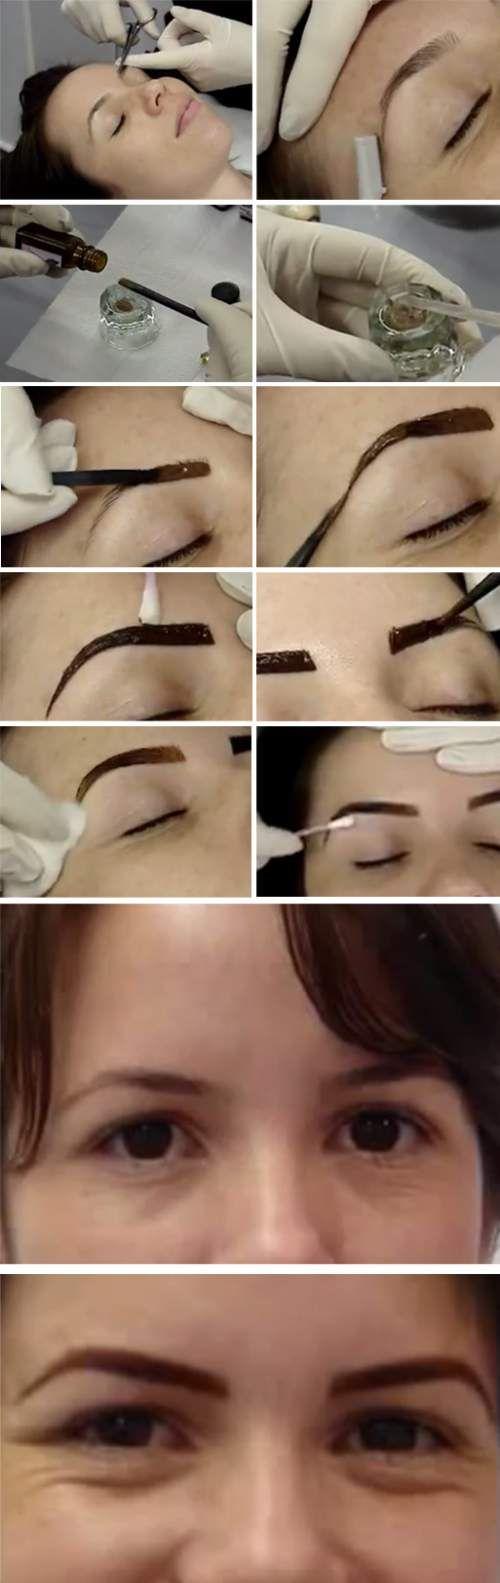 Right Way To Use Henna For Eyebrow Dye Henna Eyebrows Henna Hair Dyes Henna Hair